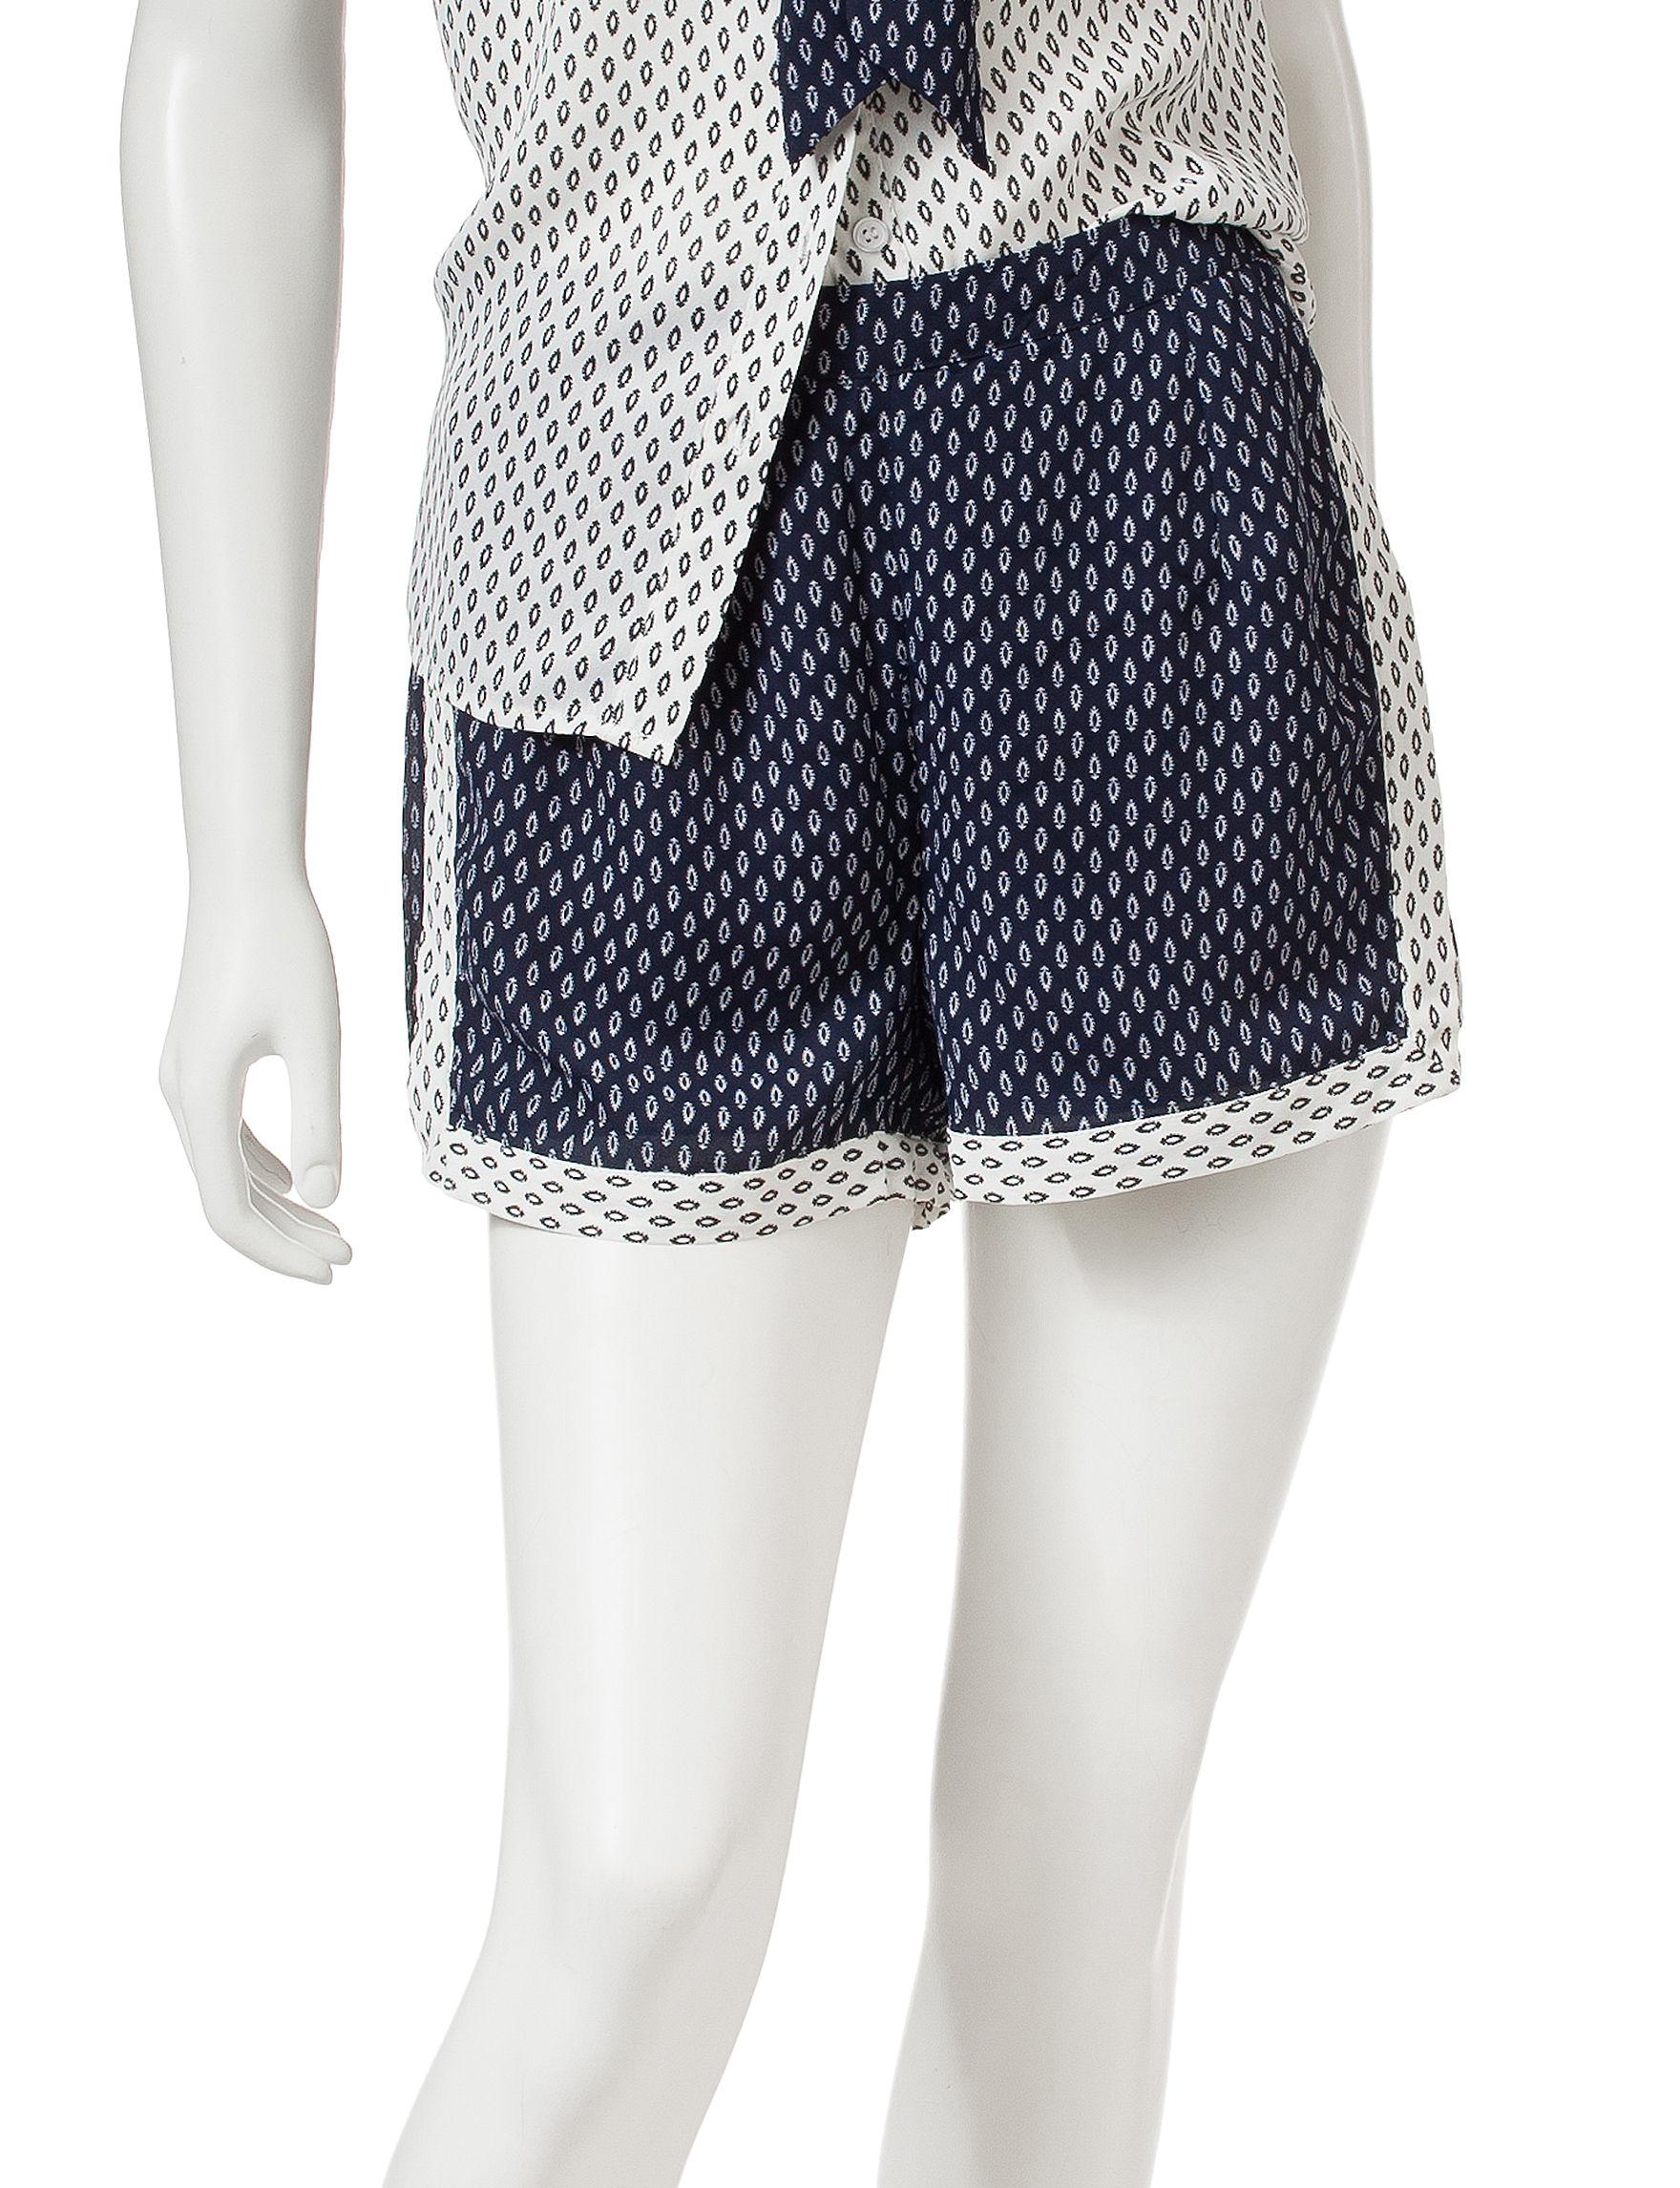 Romeo + Juliet Couture Blue / White Soft Shorts